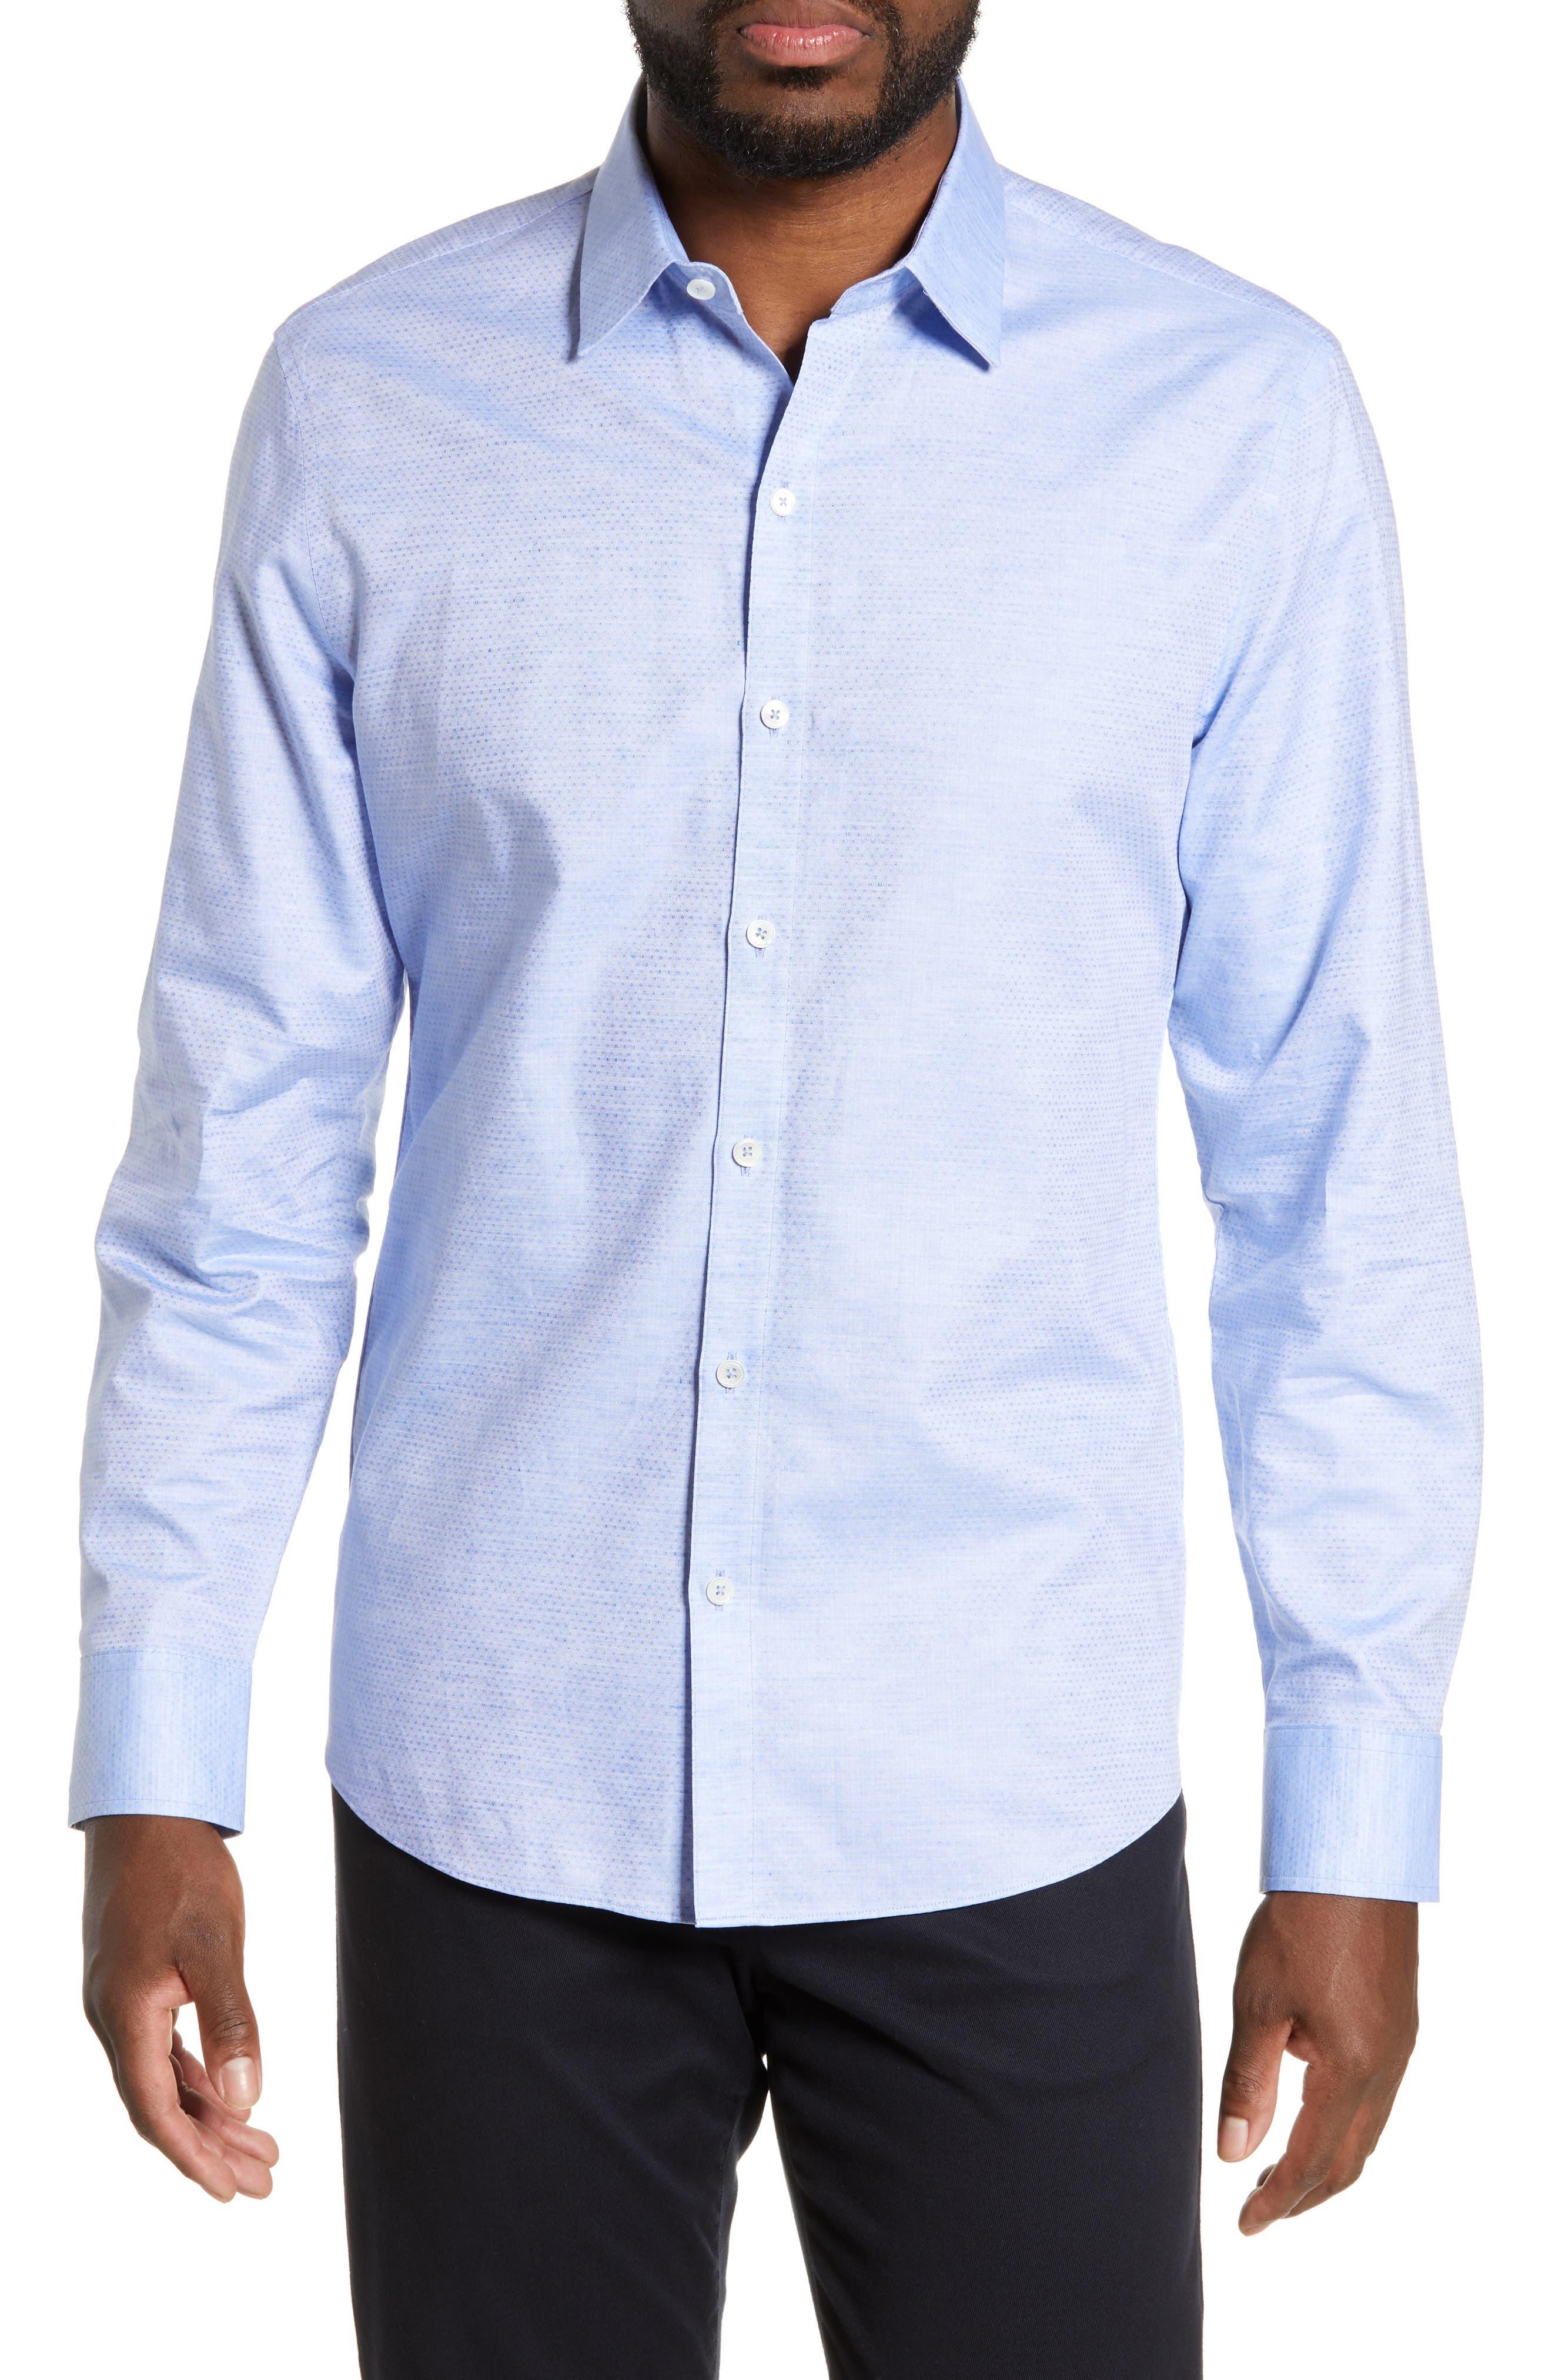 ZACHARY PRELL, Alfano Regular Fit Cotton & Linen Sport Shirt, Main thumbnail 1, color, LT BLUE